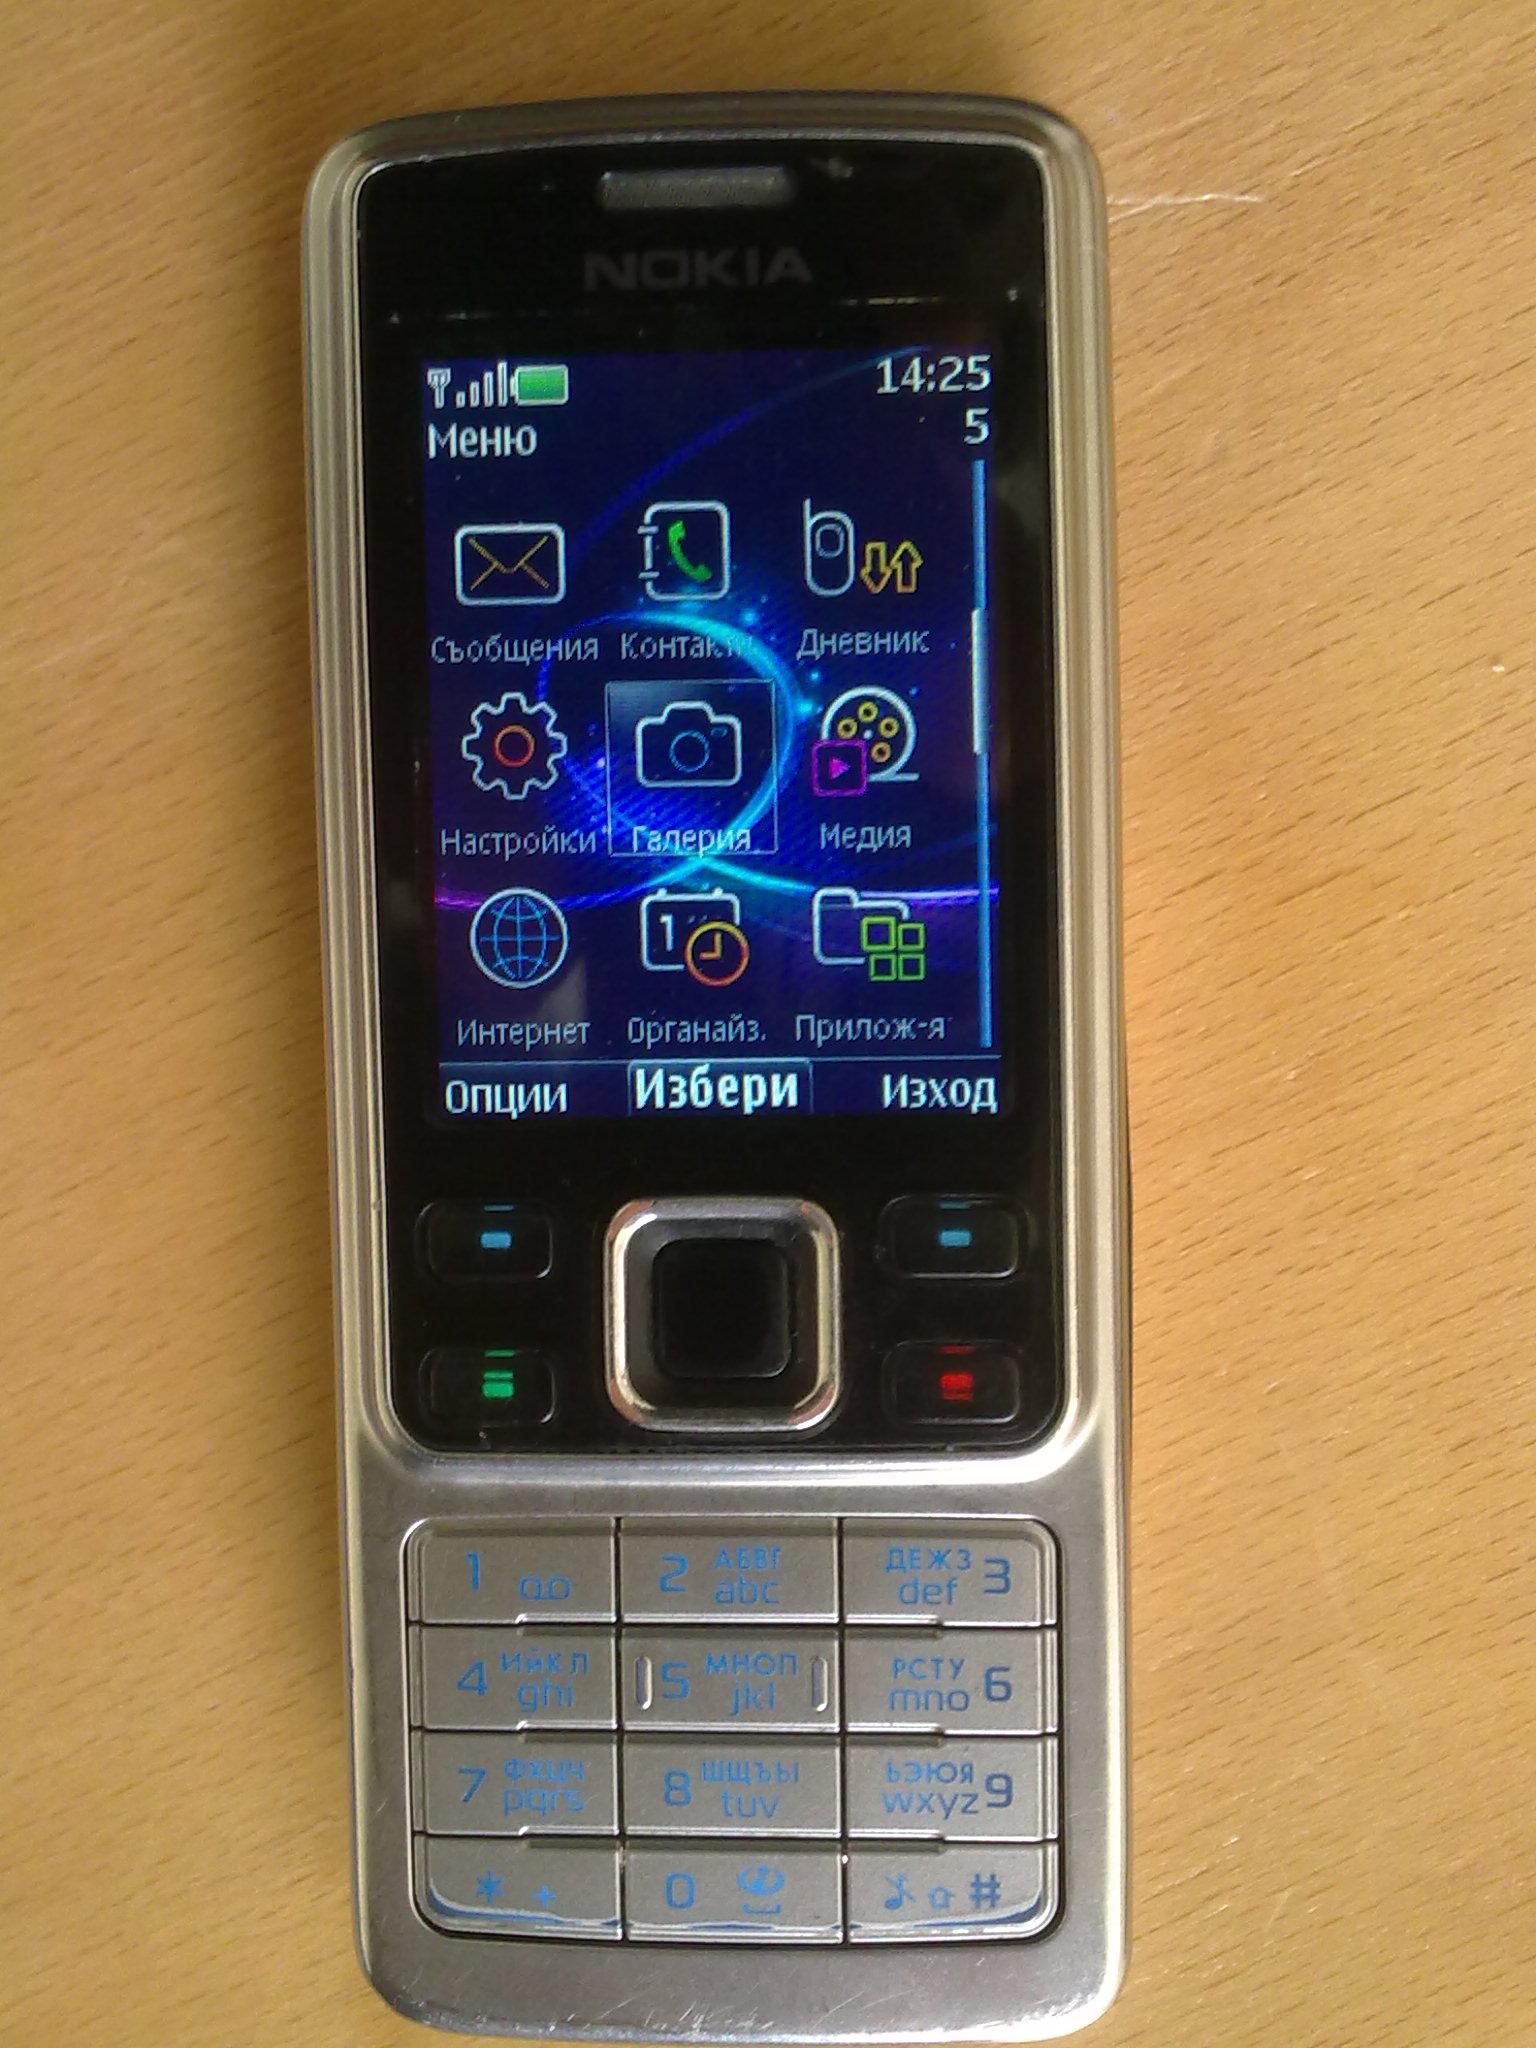 Themes Samsung 6300